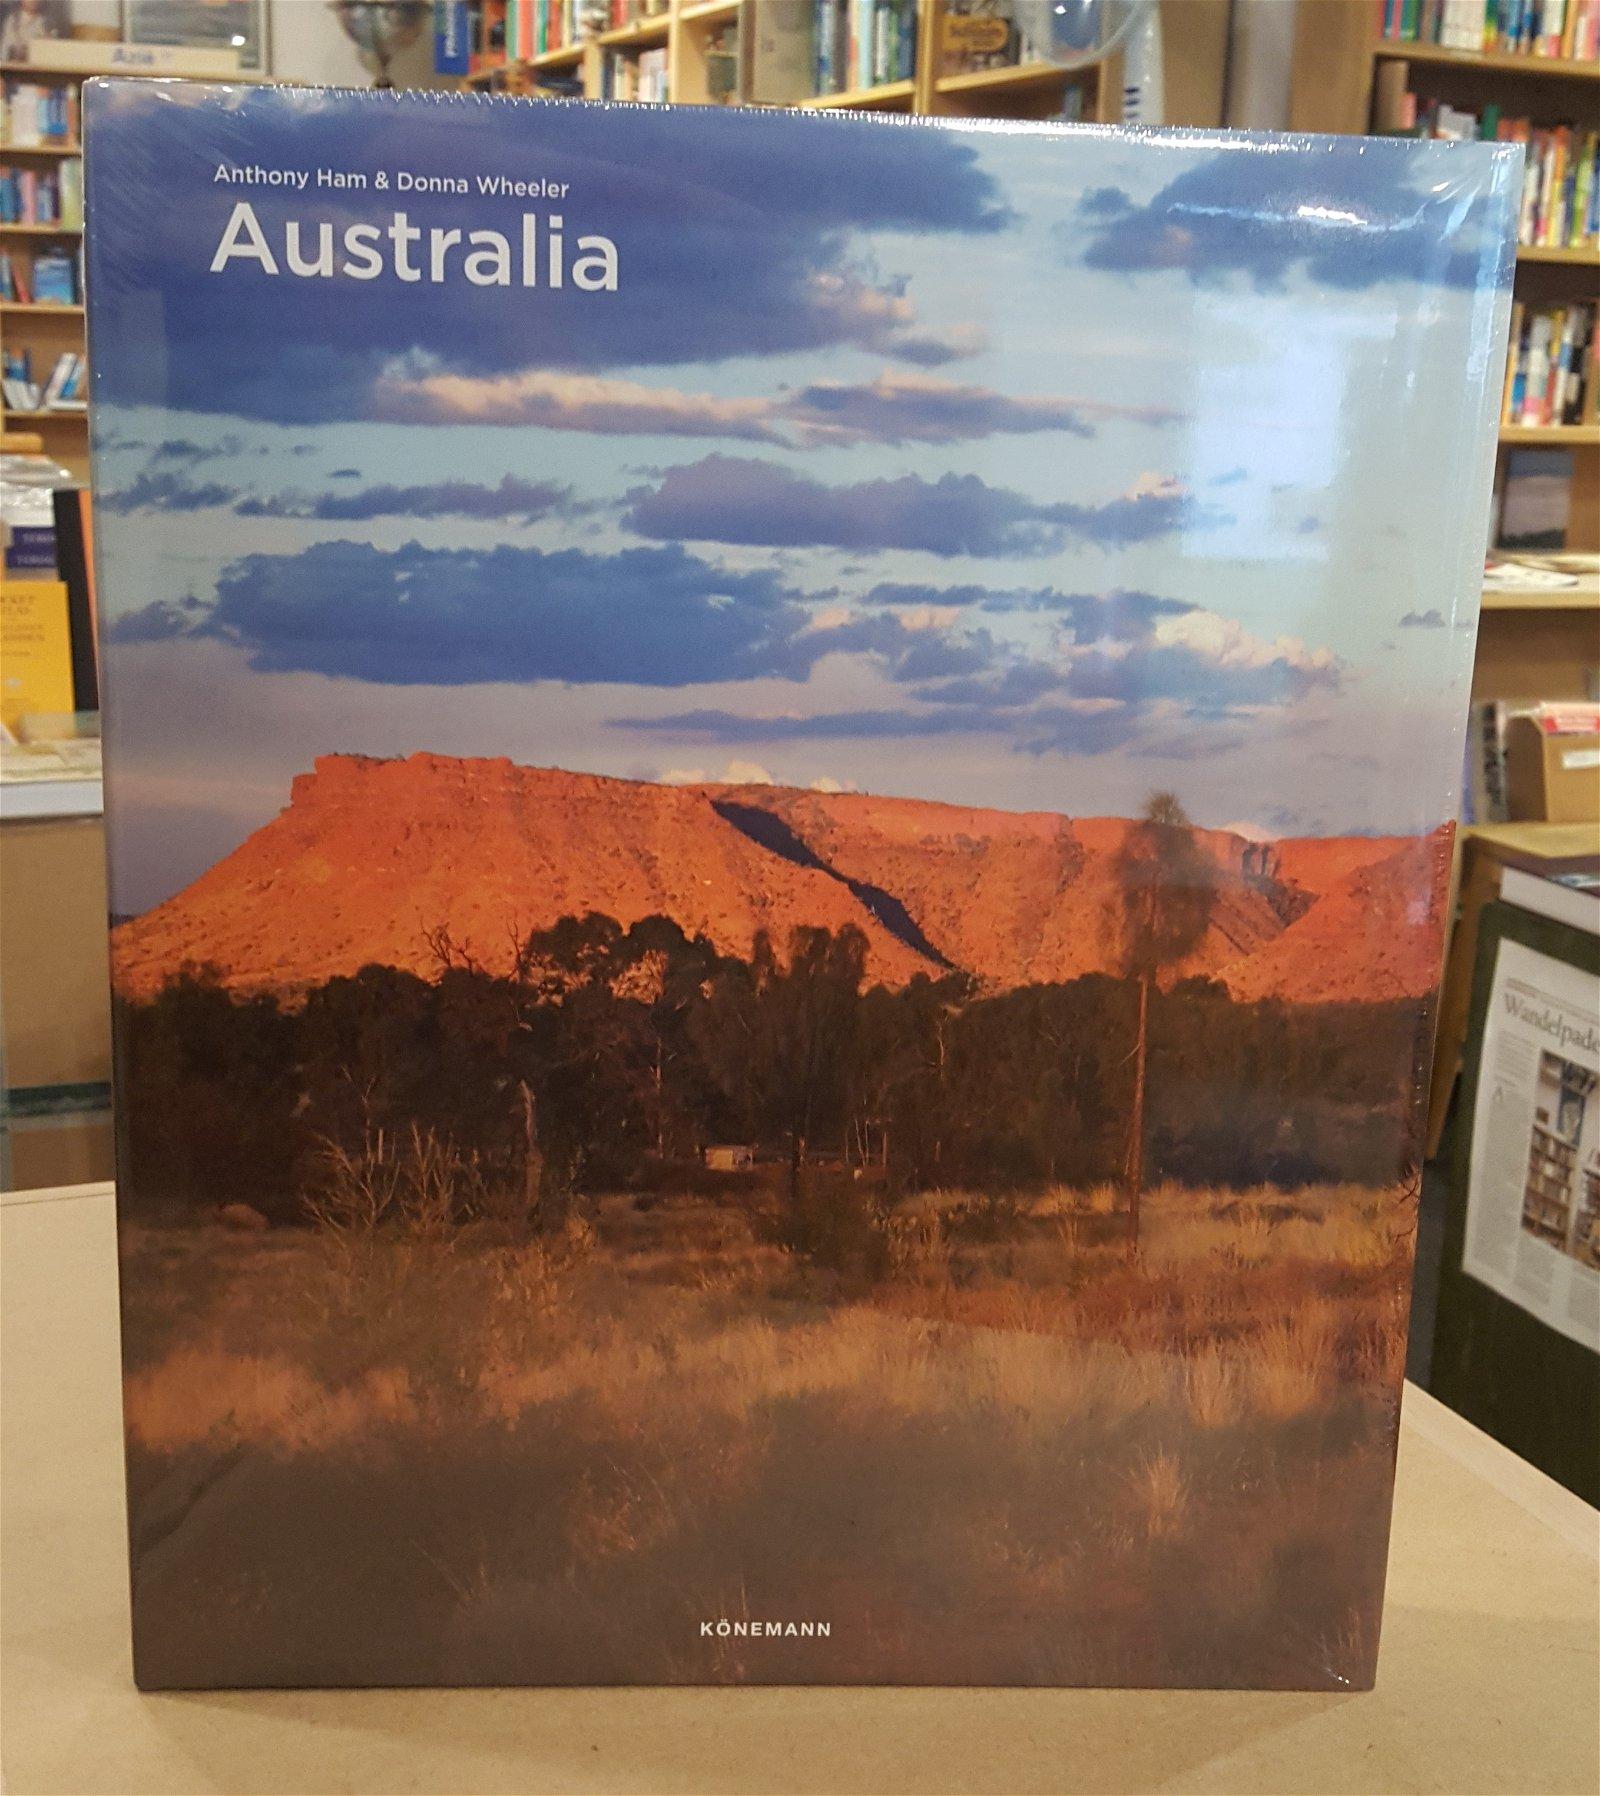 Australia | fotoboek Australië 9783741920370  Könemann   Fotoboeken Australië